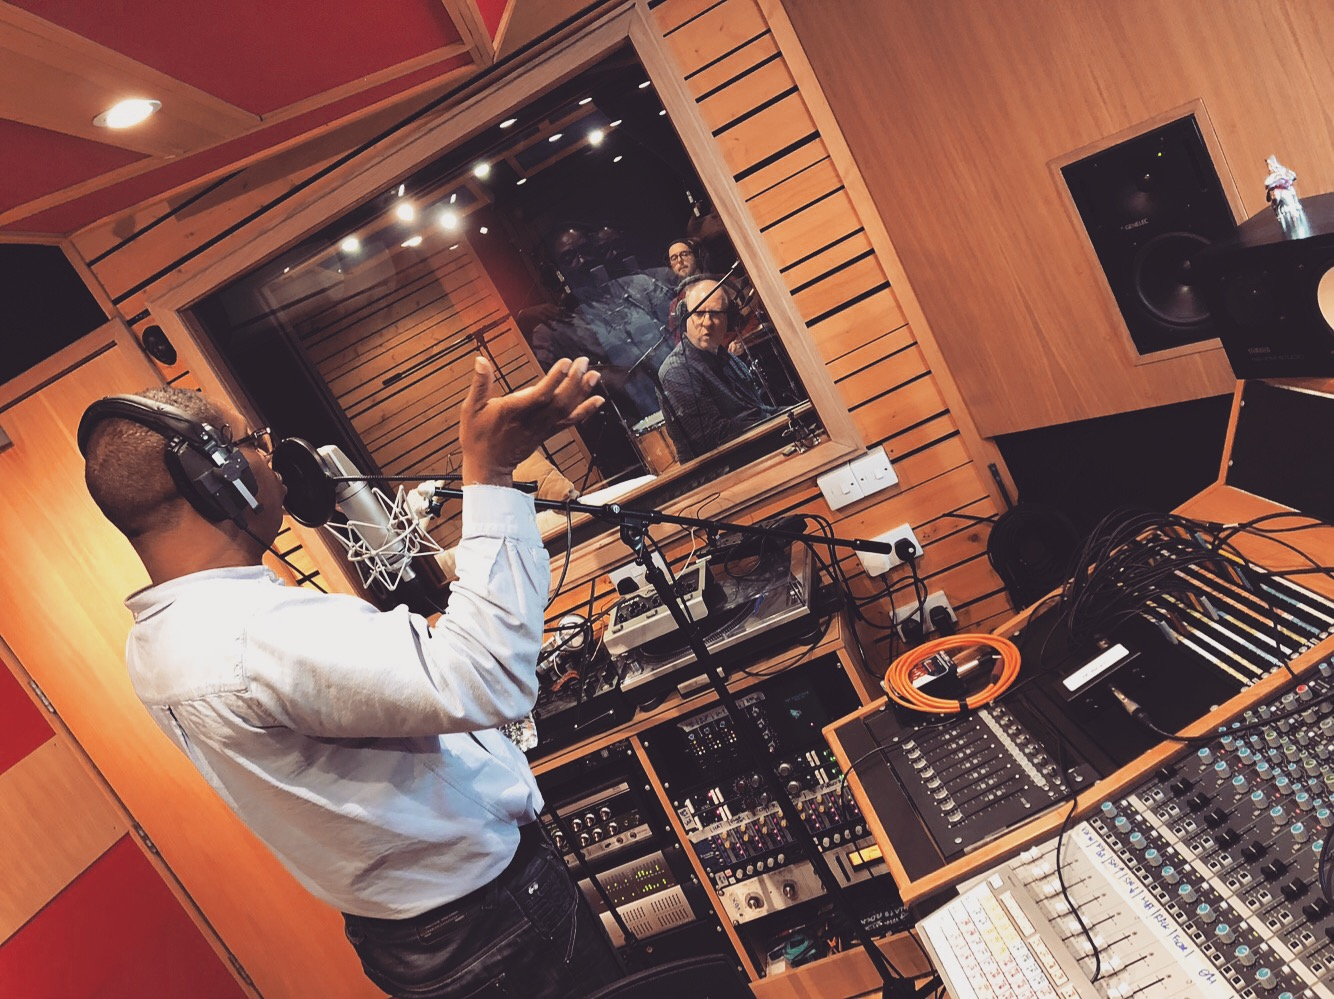 Slipway-Studio_Recording-Session_Jazz-band_1